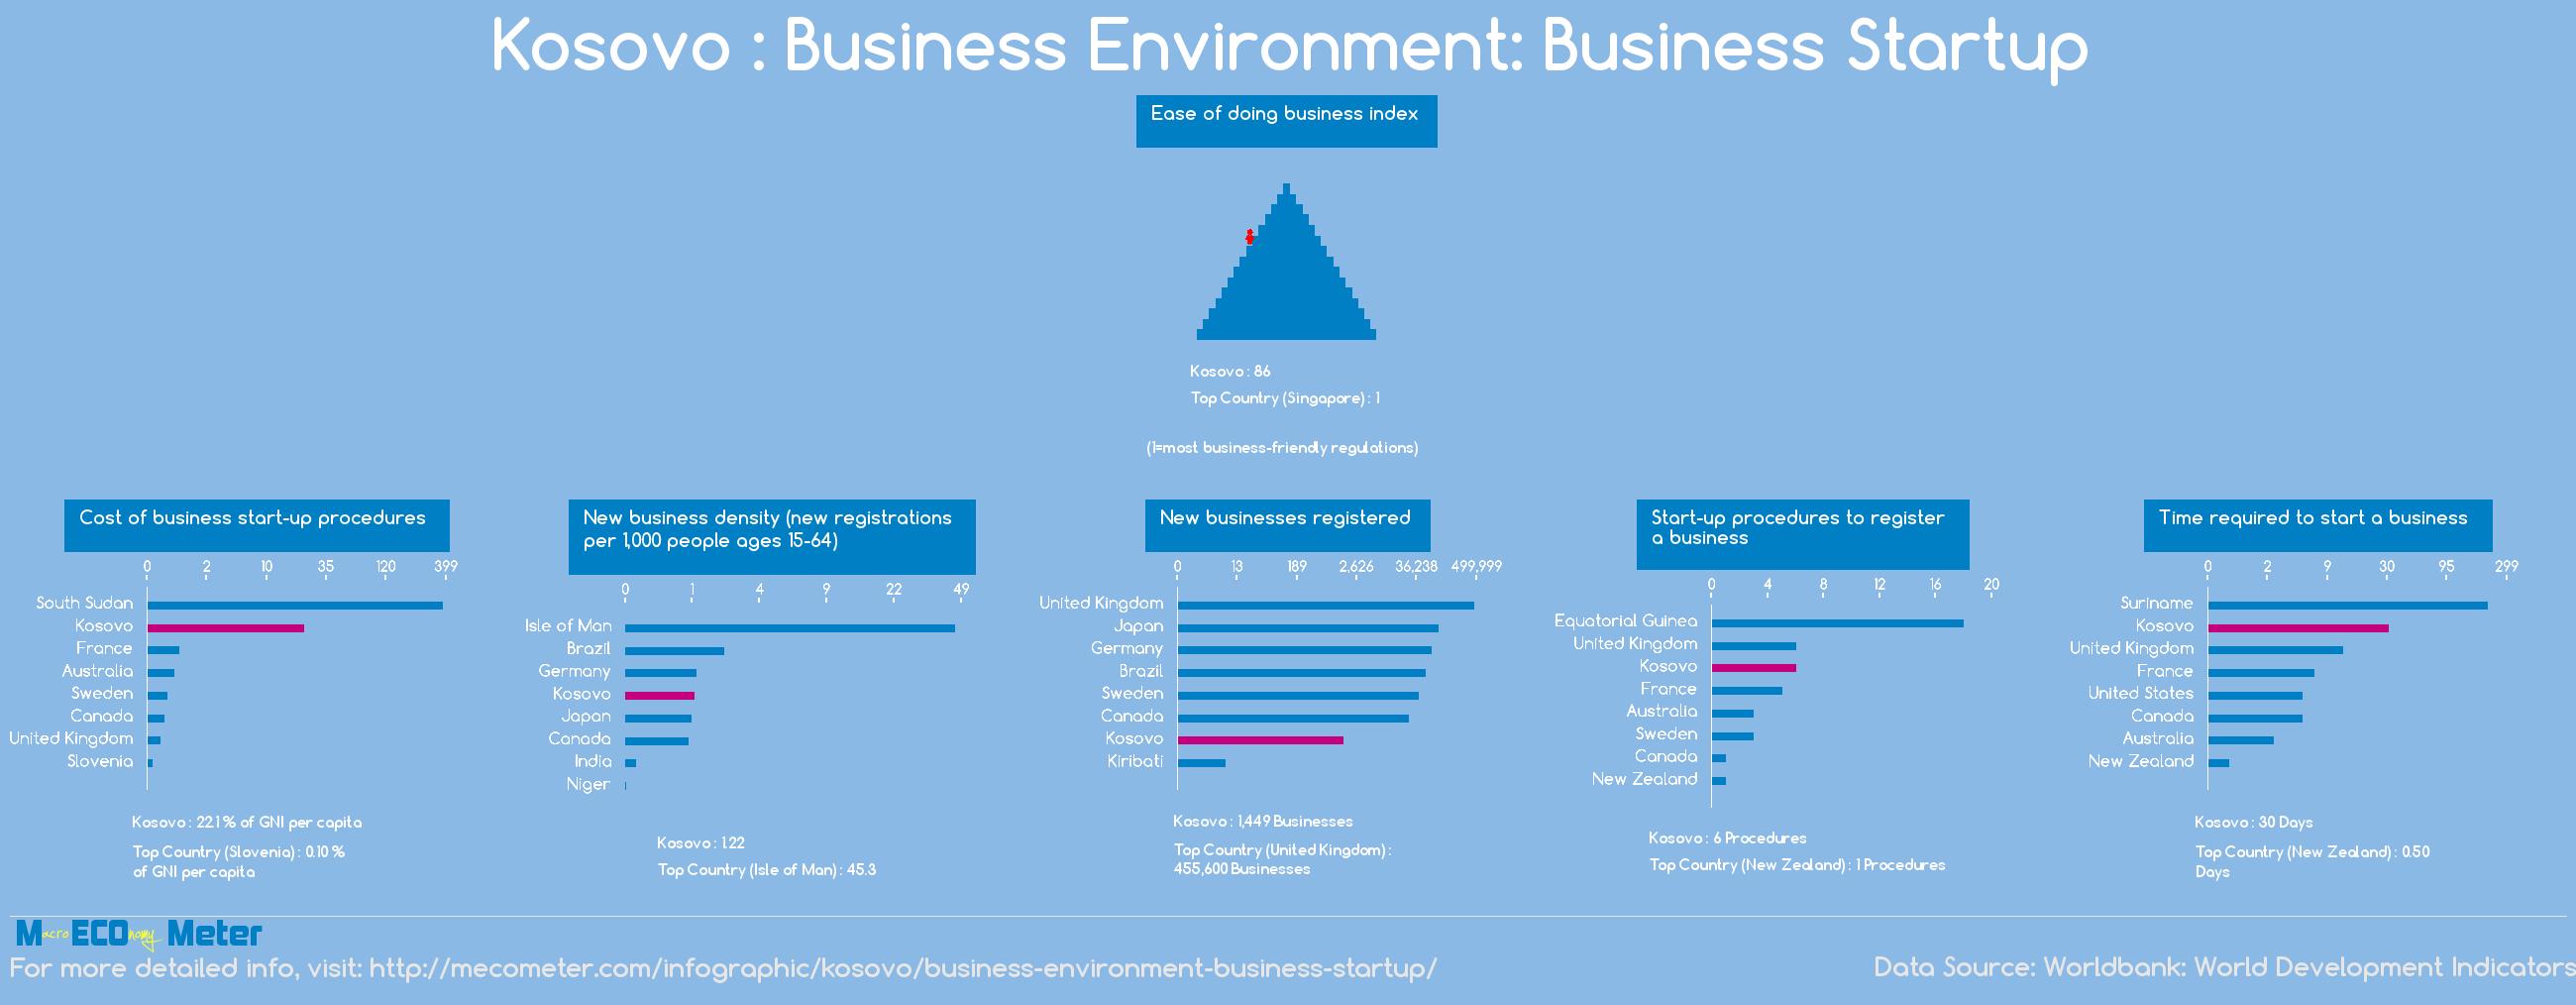 Kosovo : Business Environment: Business Startup